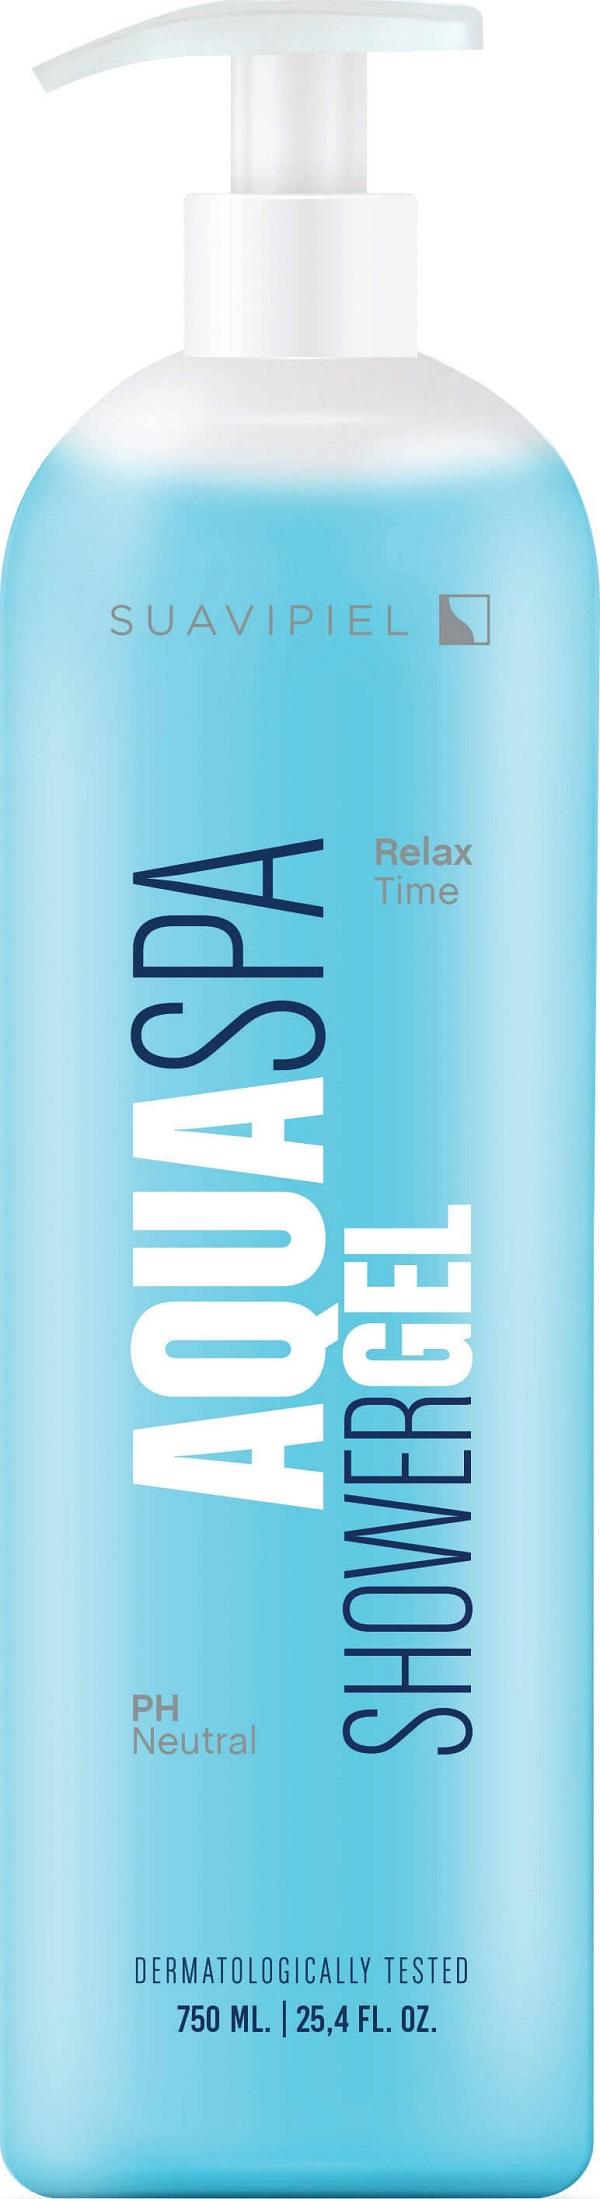 Fotografie Suavipiel Aqua Spa sprchový gel pro relaxaci 750 ml